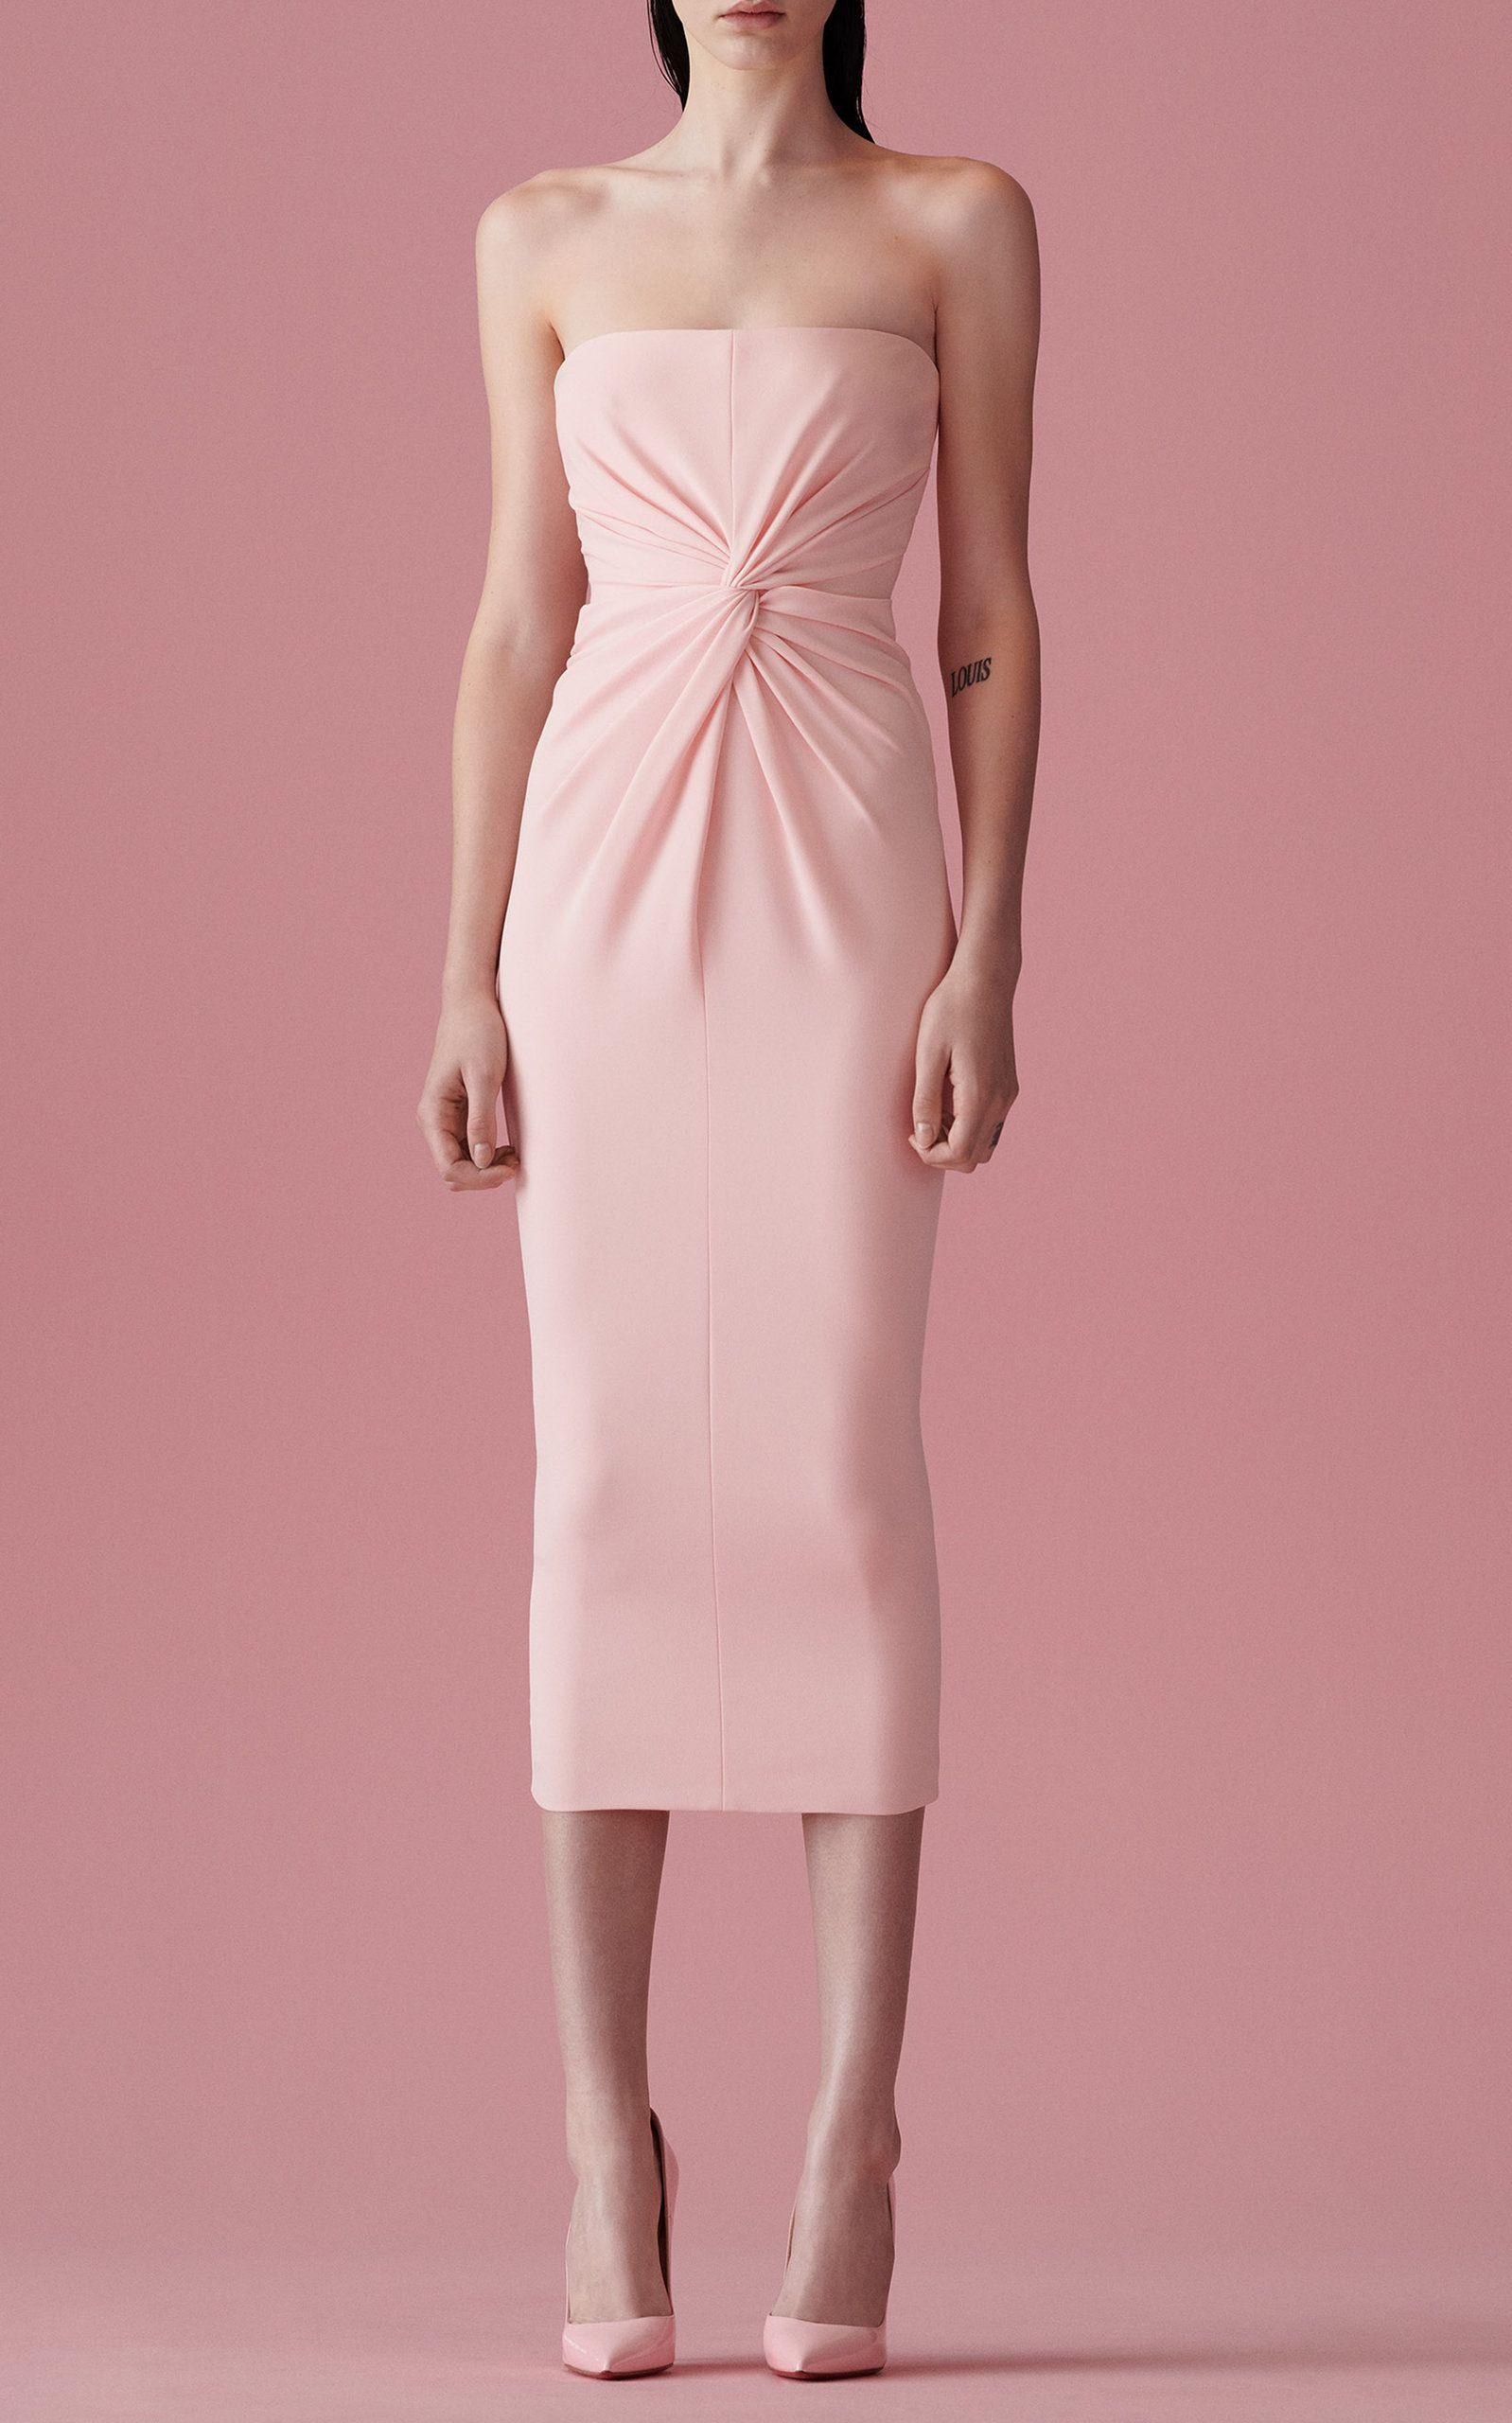 Alex Perry Lindsey Ruched Crepe Midi Dress Strapless Midi Dress Dresses Fashion [ 2560 x 1598 Pixel ]